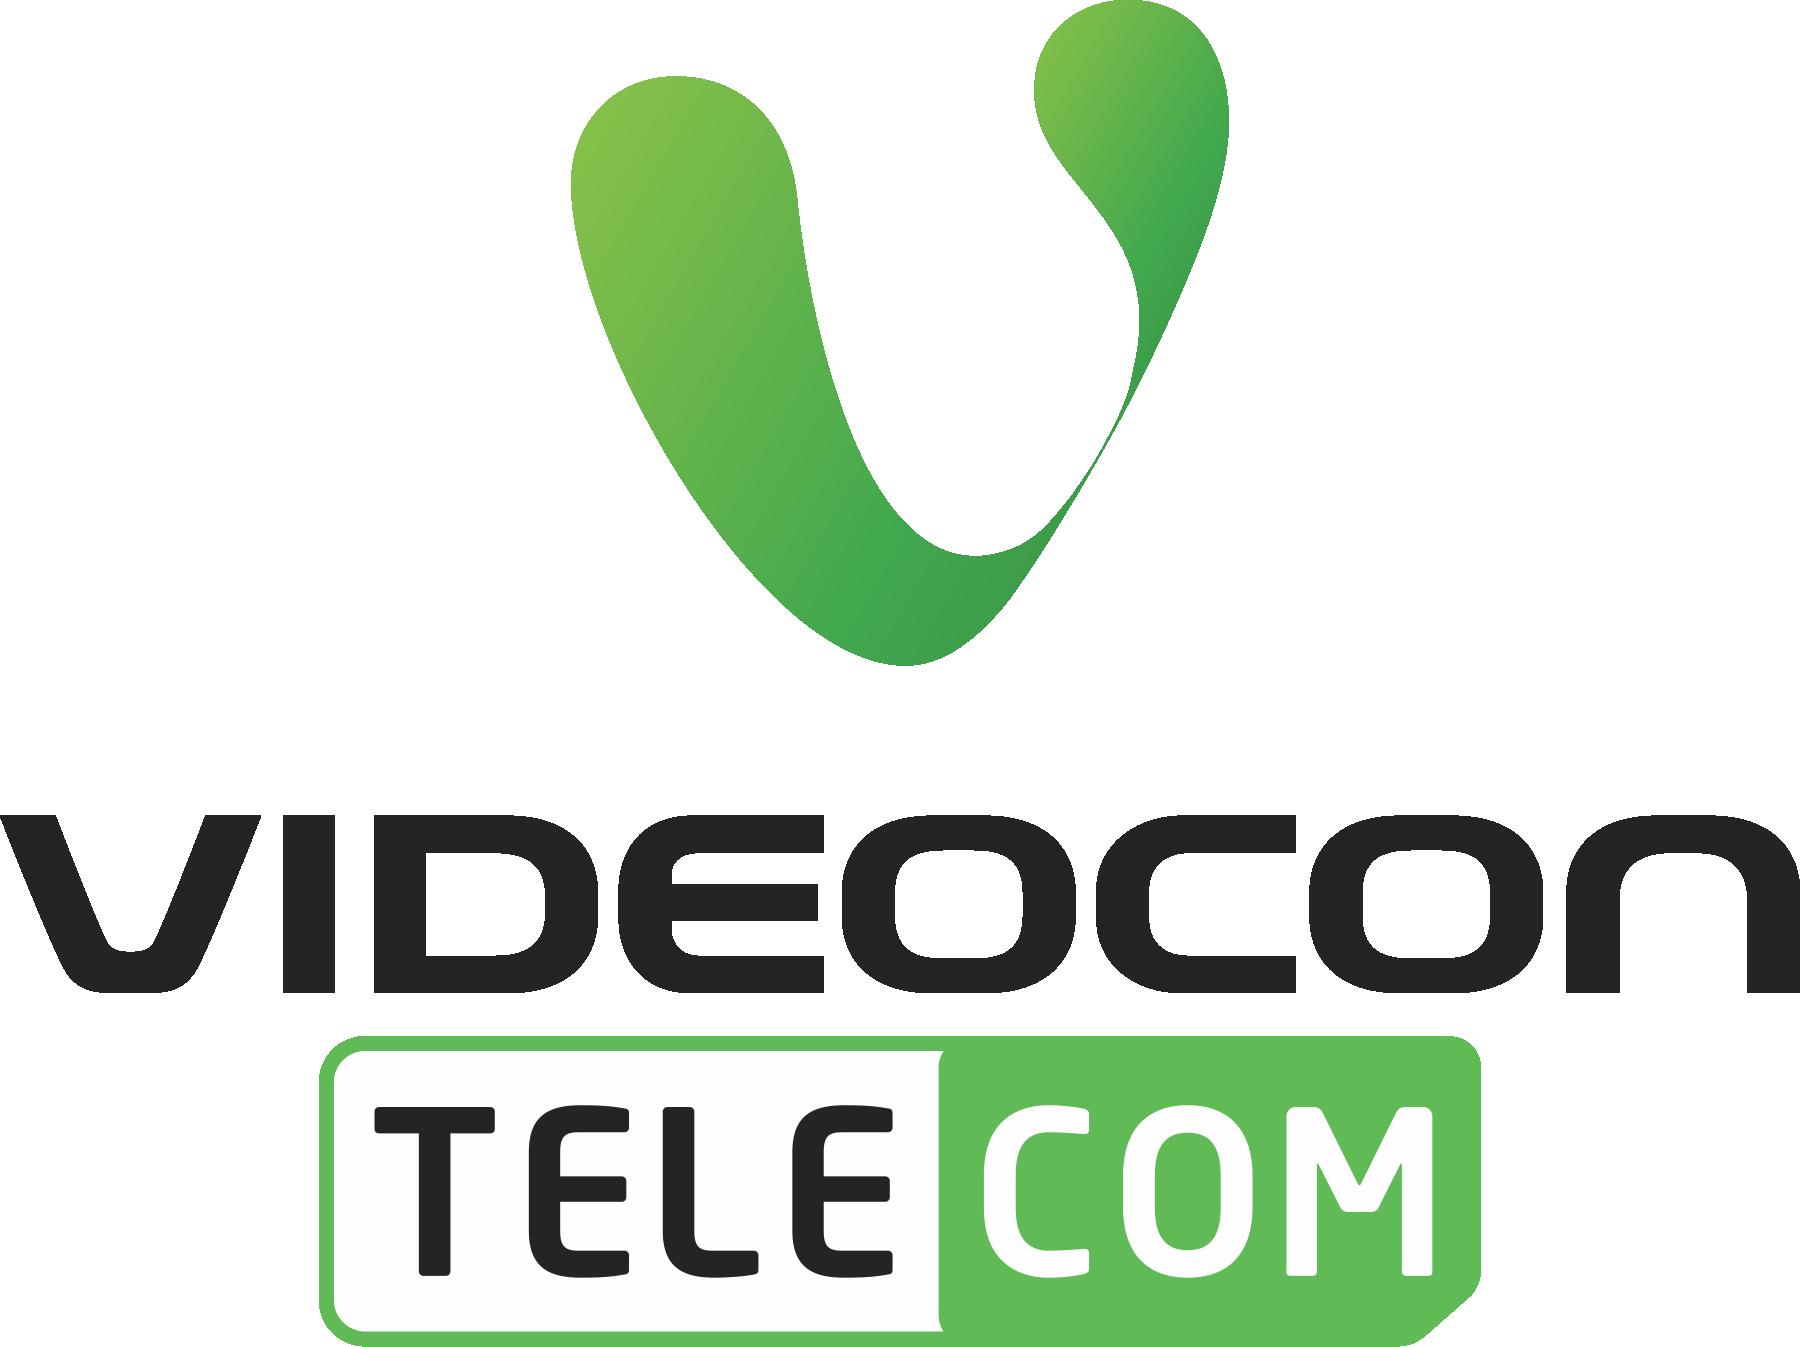 VTL_logo (1)